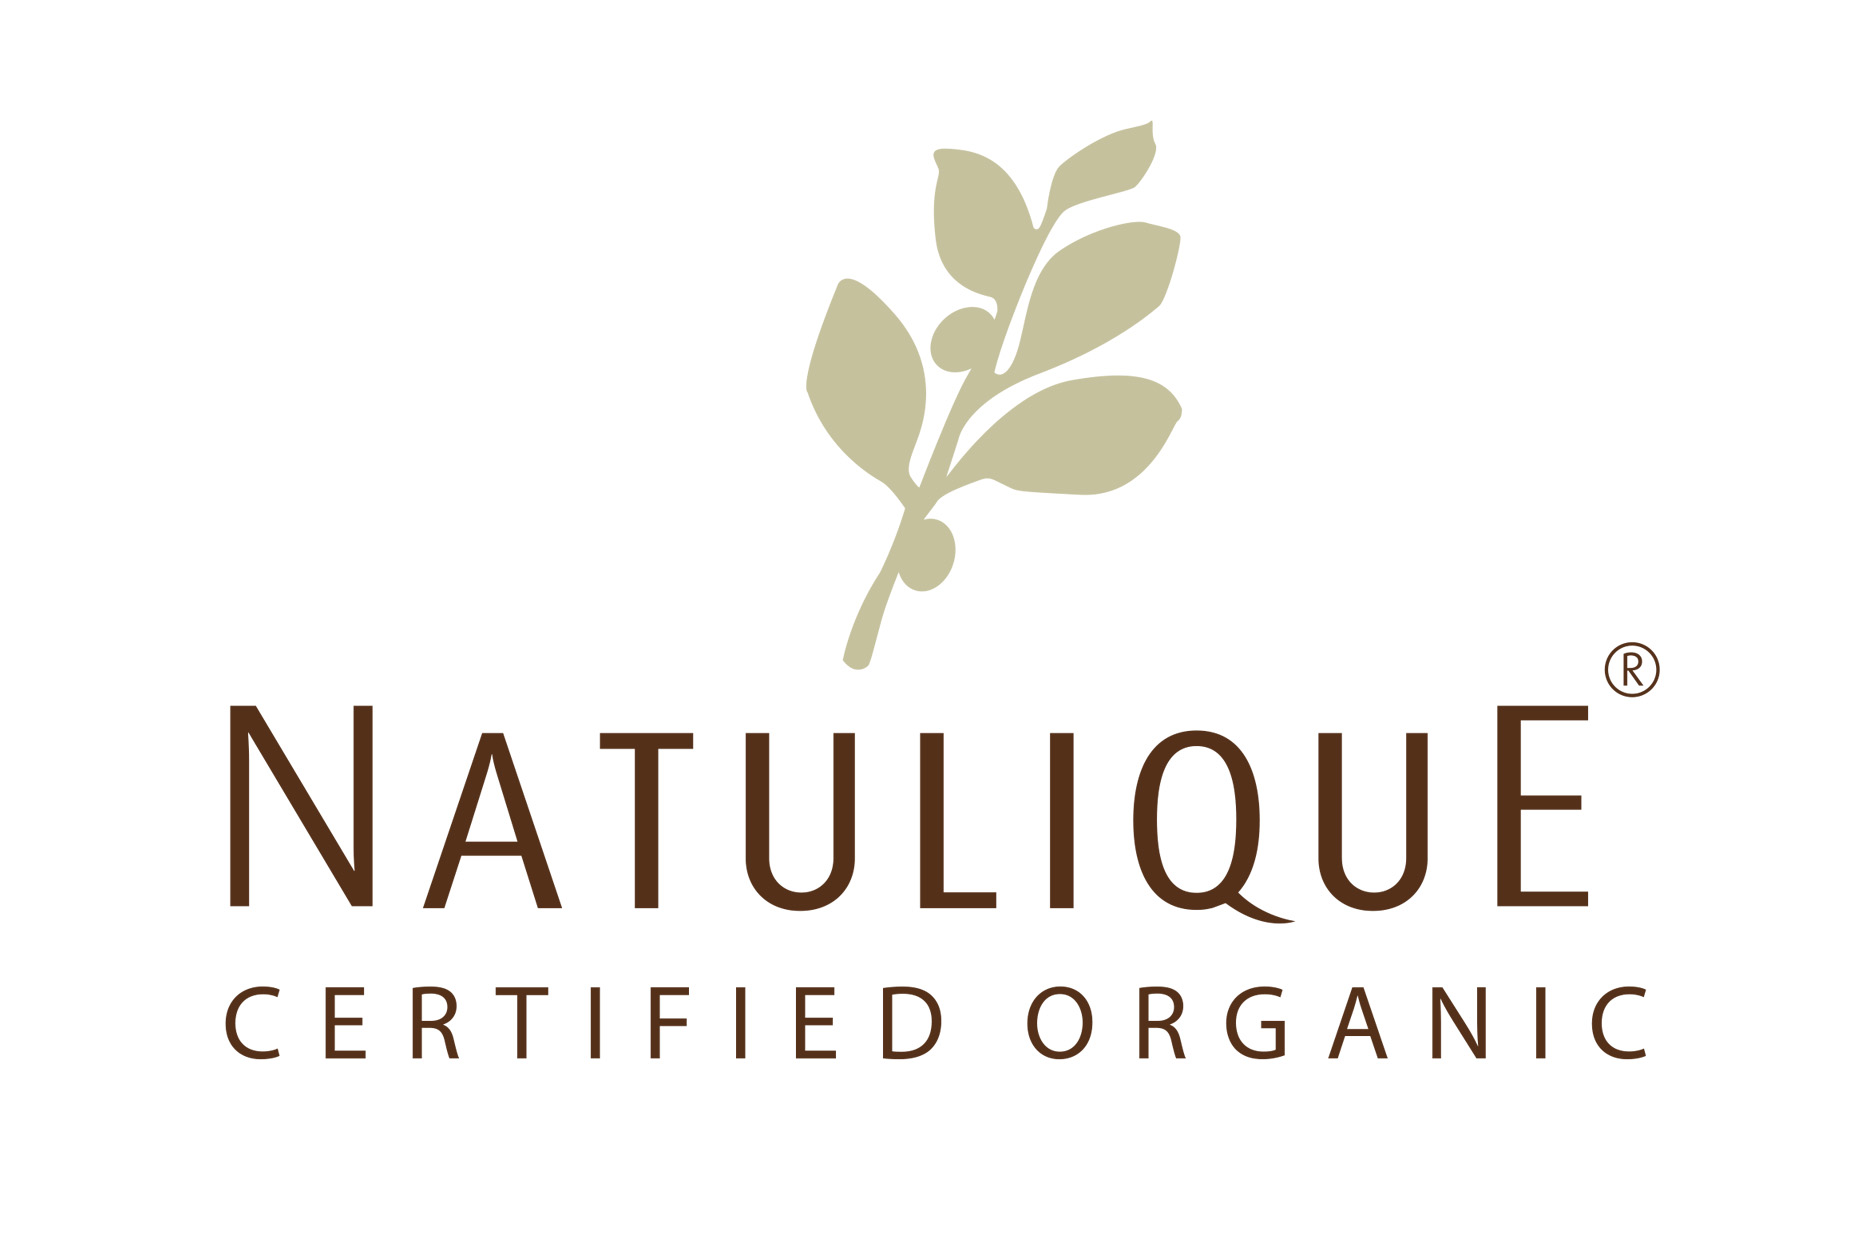 Natulique_Sticker_30x20cm